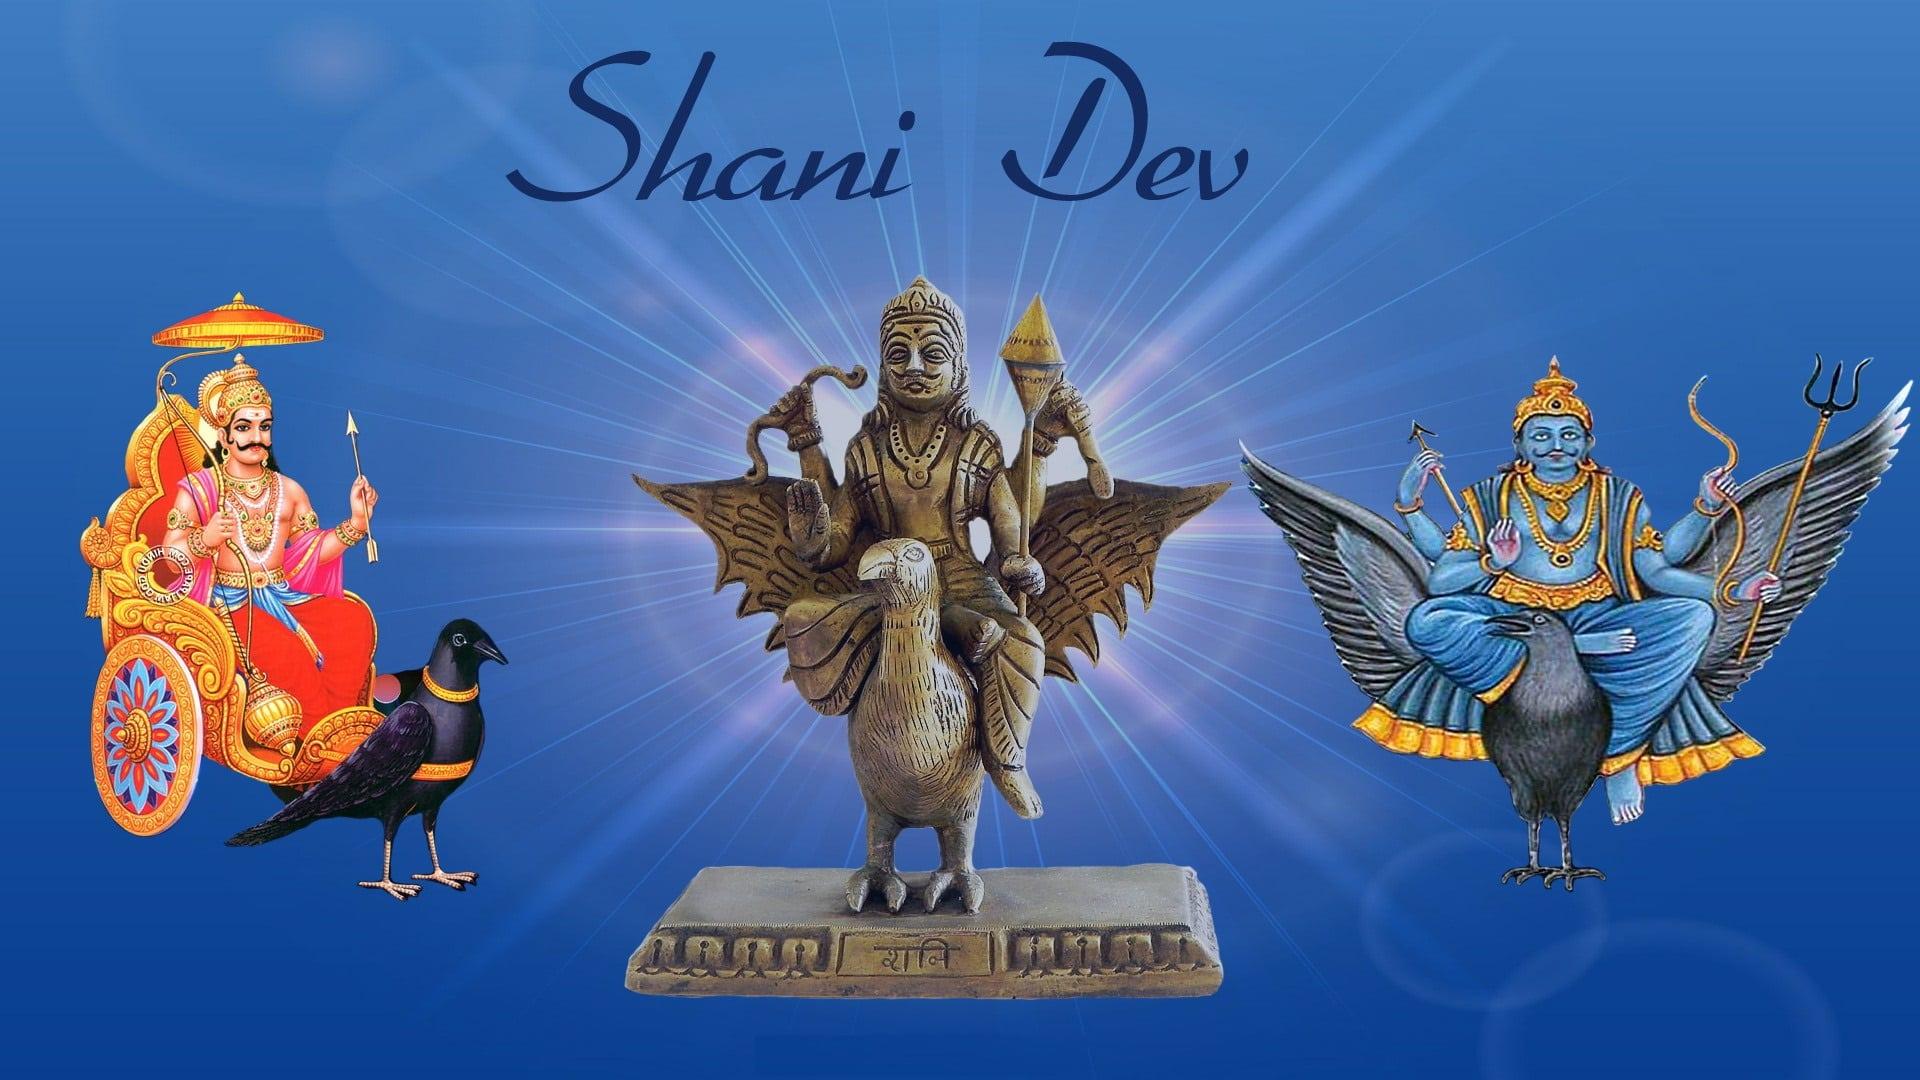 Ramayana 3d Wallpaper Lord Shani Dev Wallpapers Wordzz